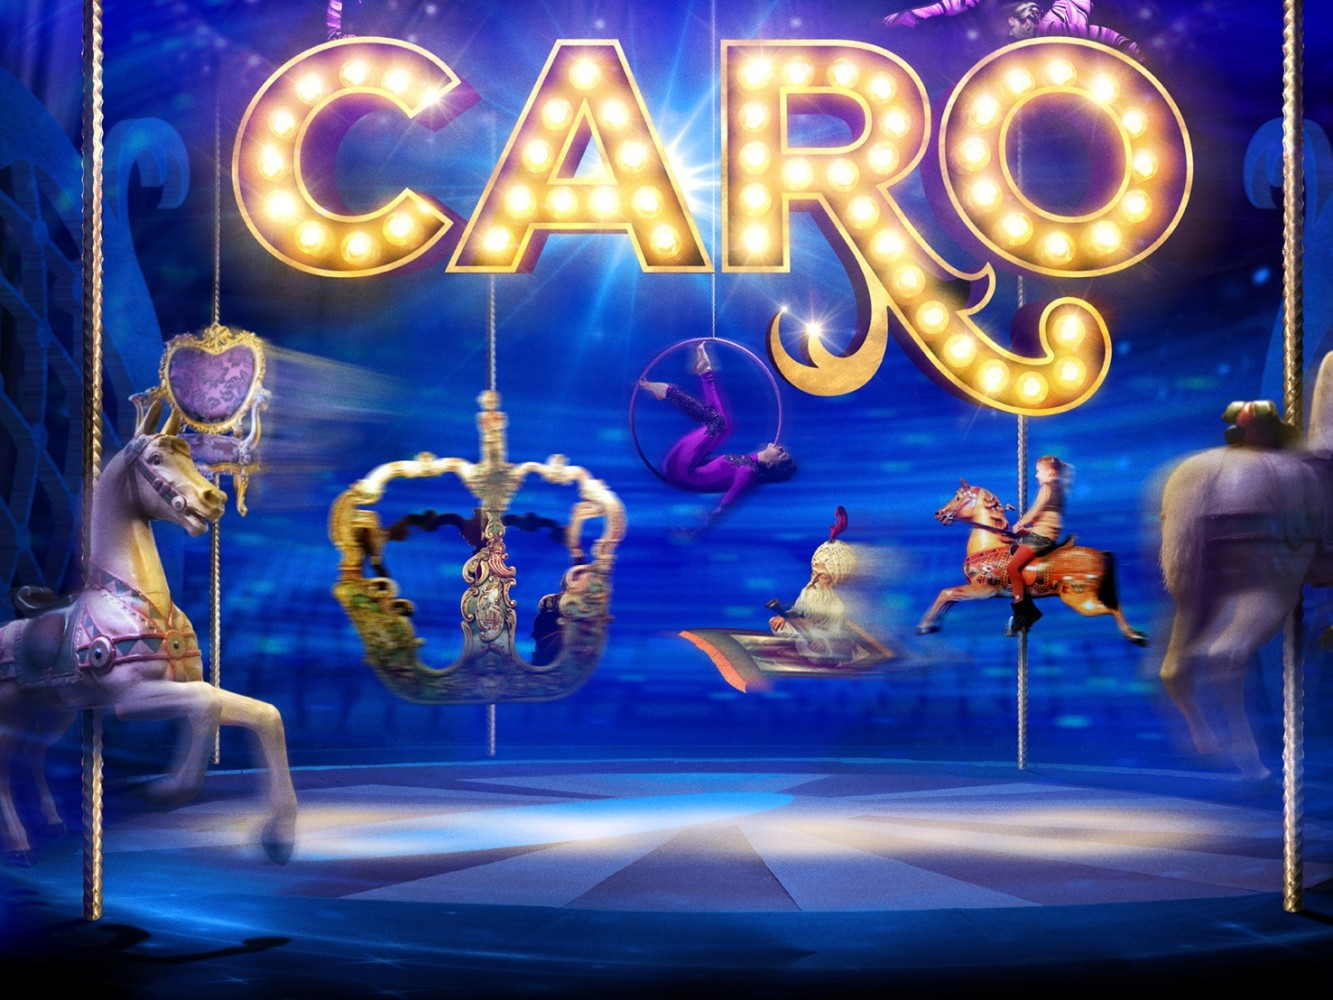 Efteling - Theatershow CARO